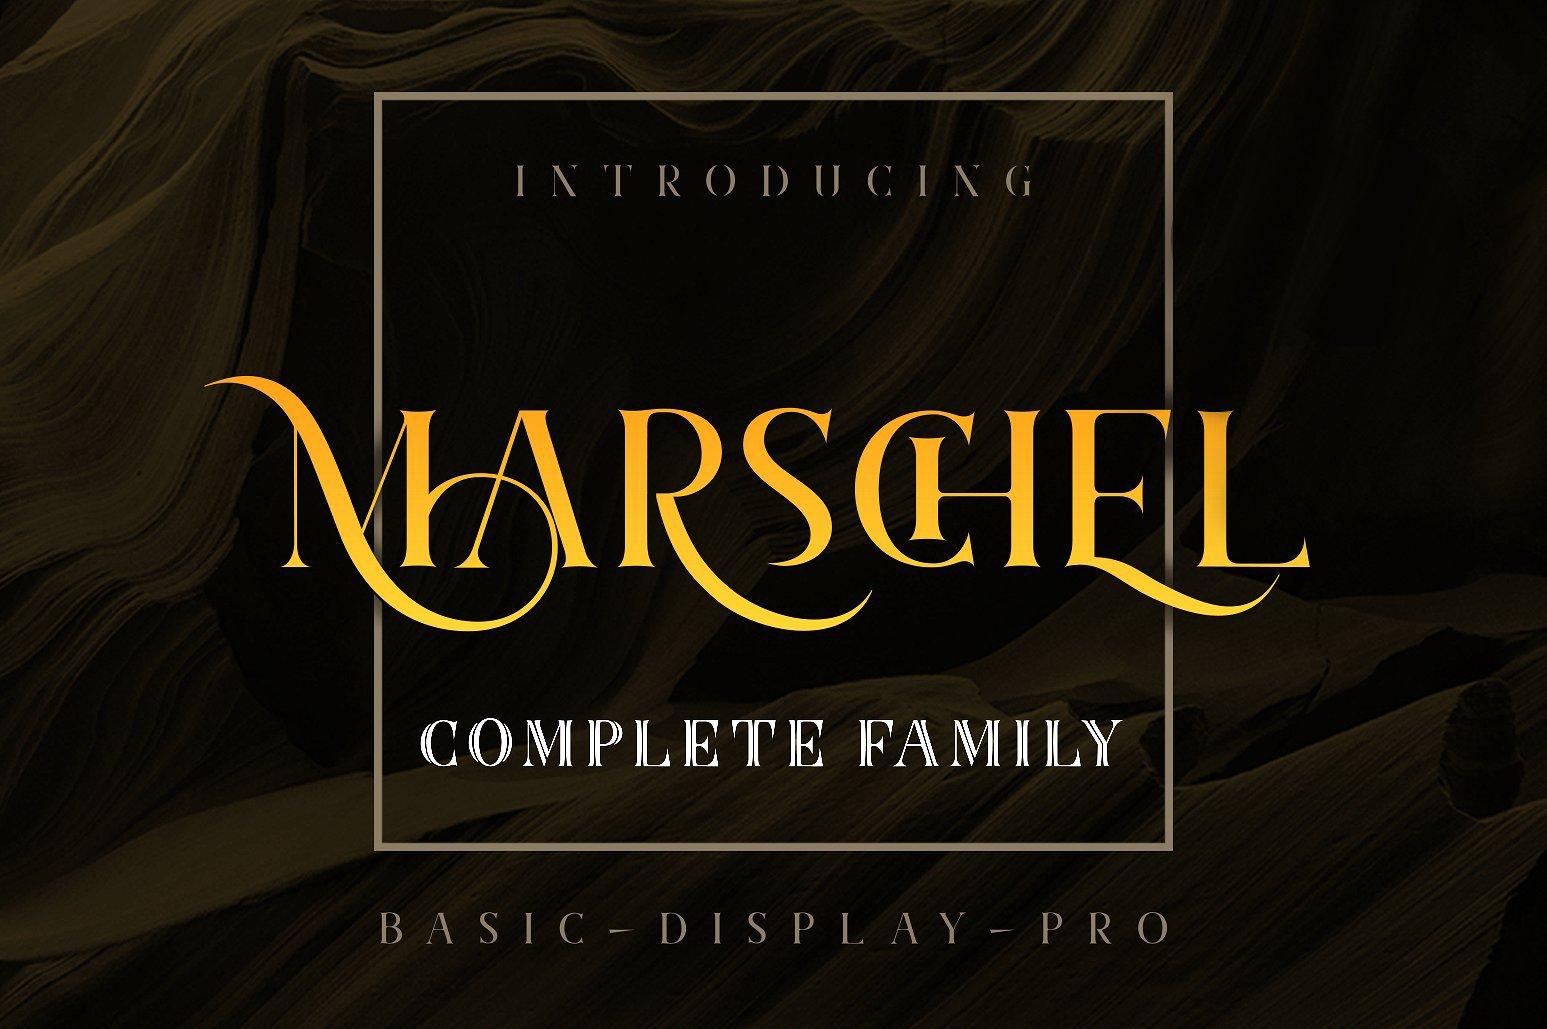 Marschel Complete Family example image 1